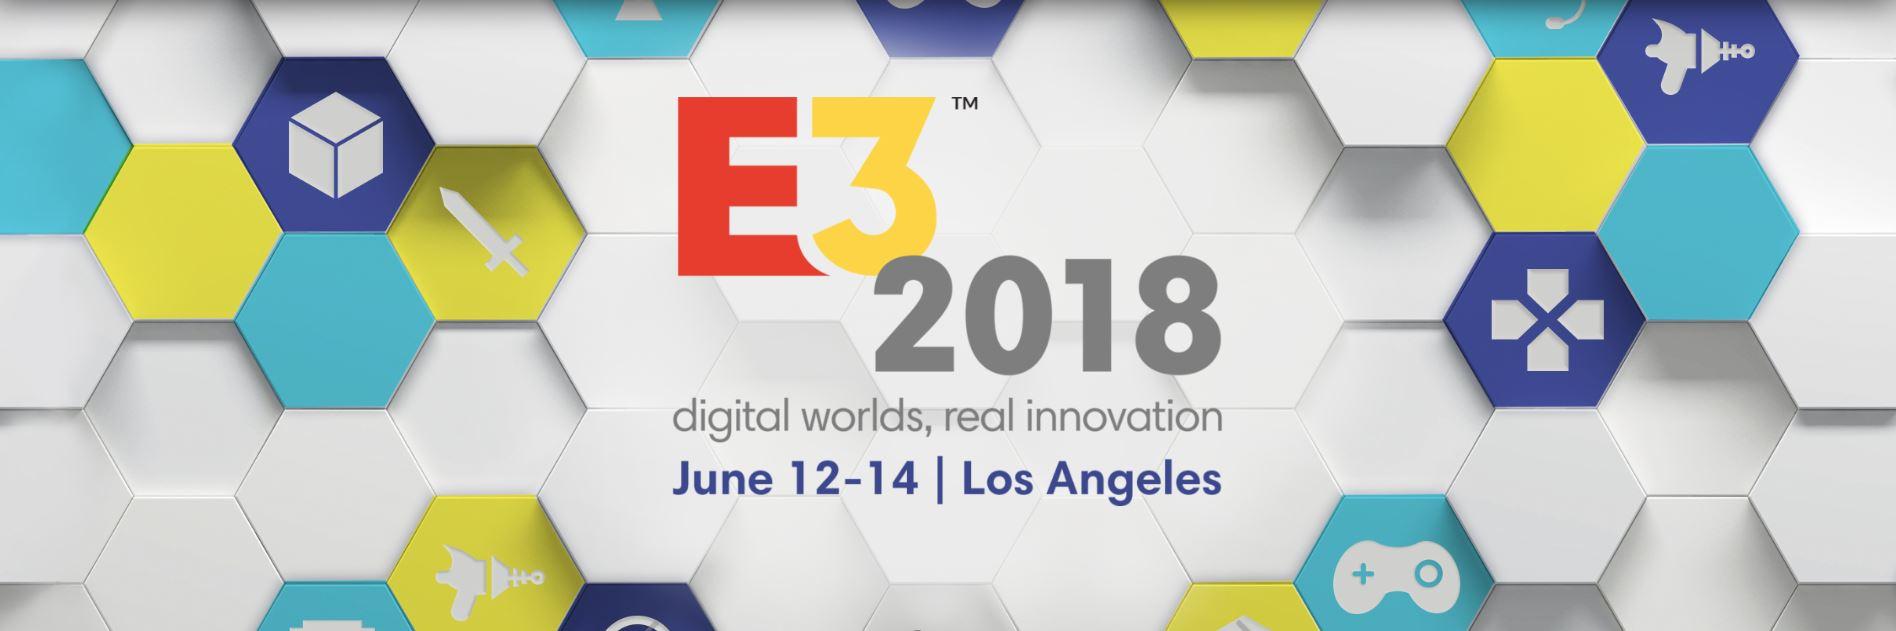 E3 2018 BlowOut